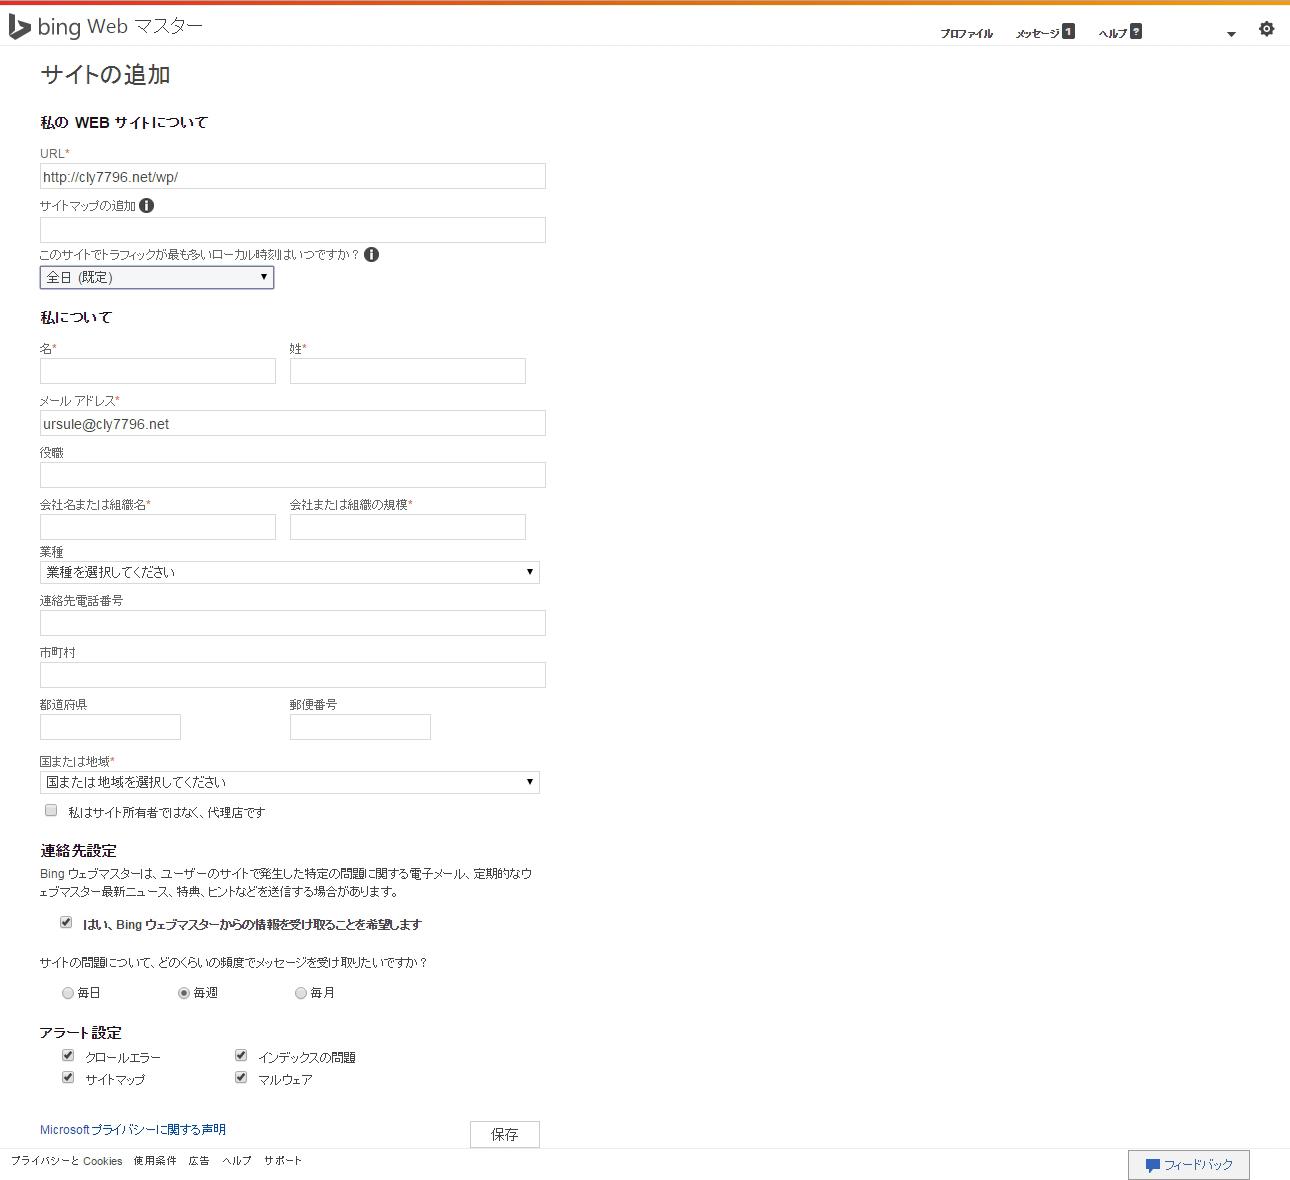 Bing Sitemap: Bingウェブマスターツールへの登録とサイトマップの送信方法